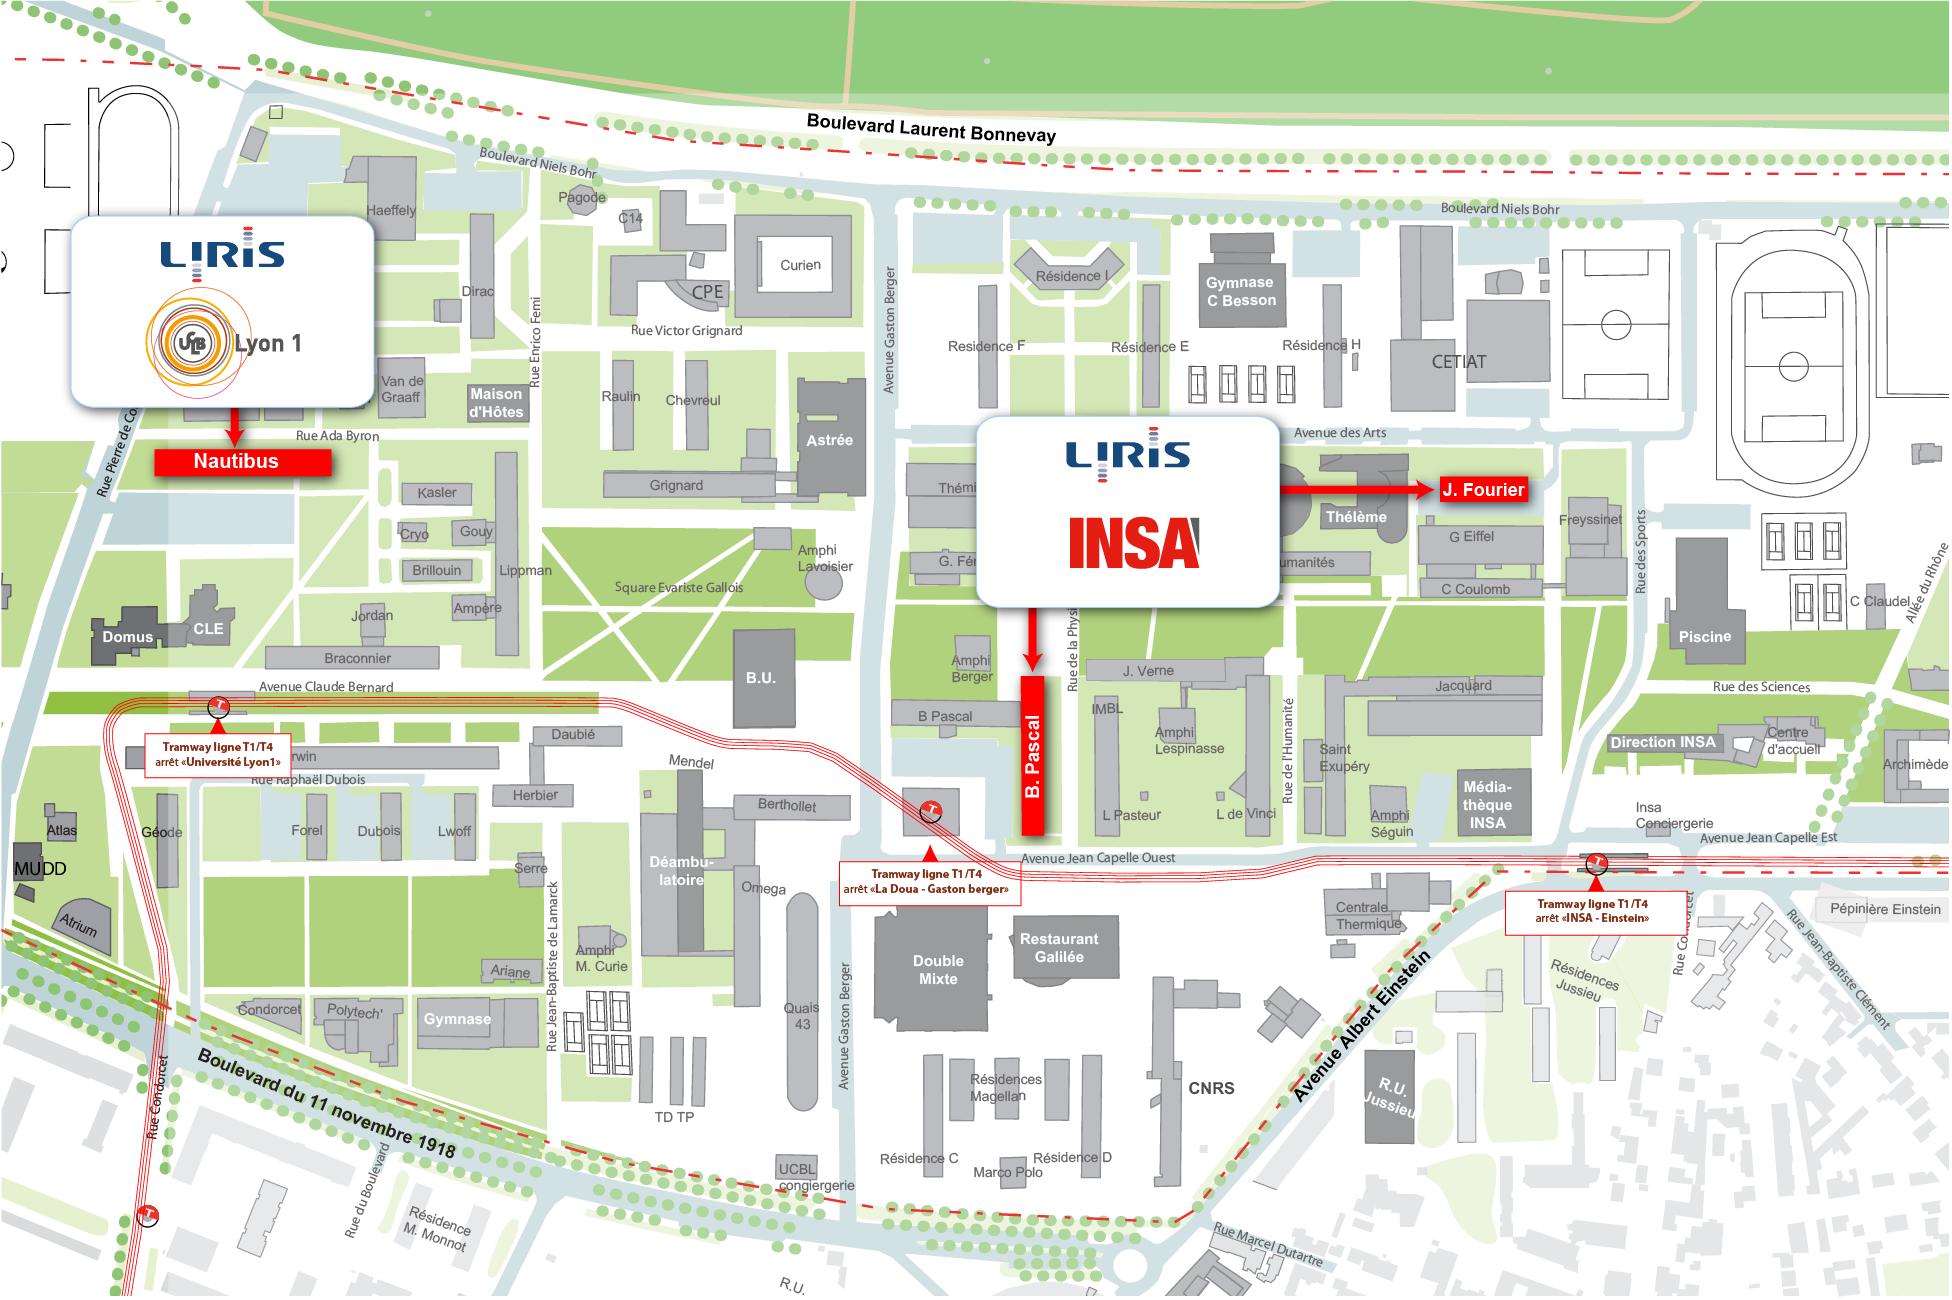 Du Campus Map on